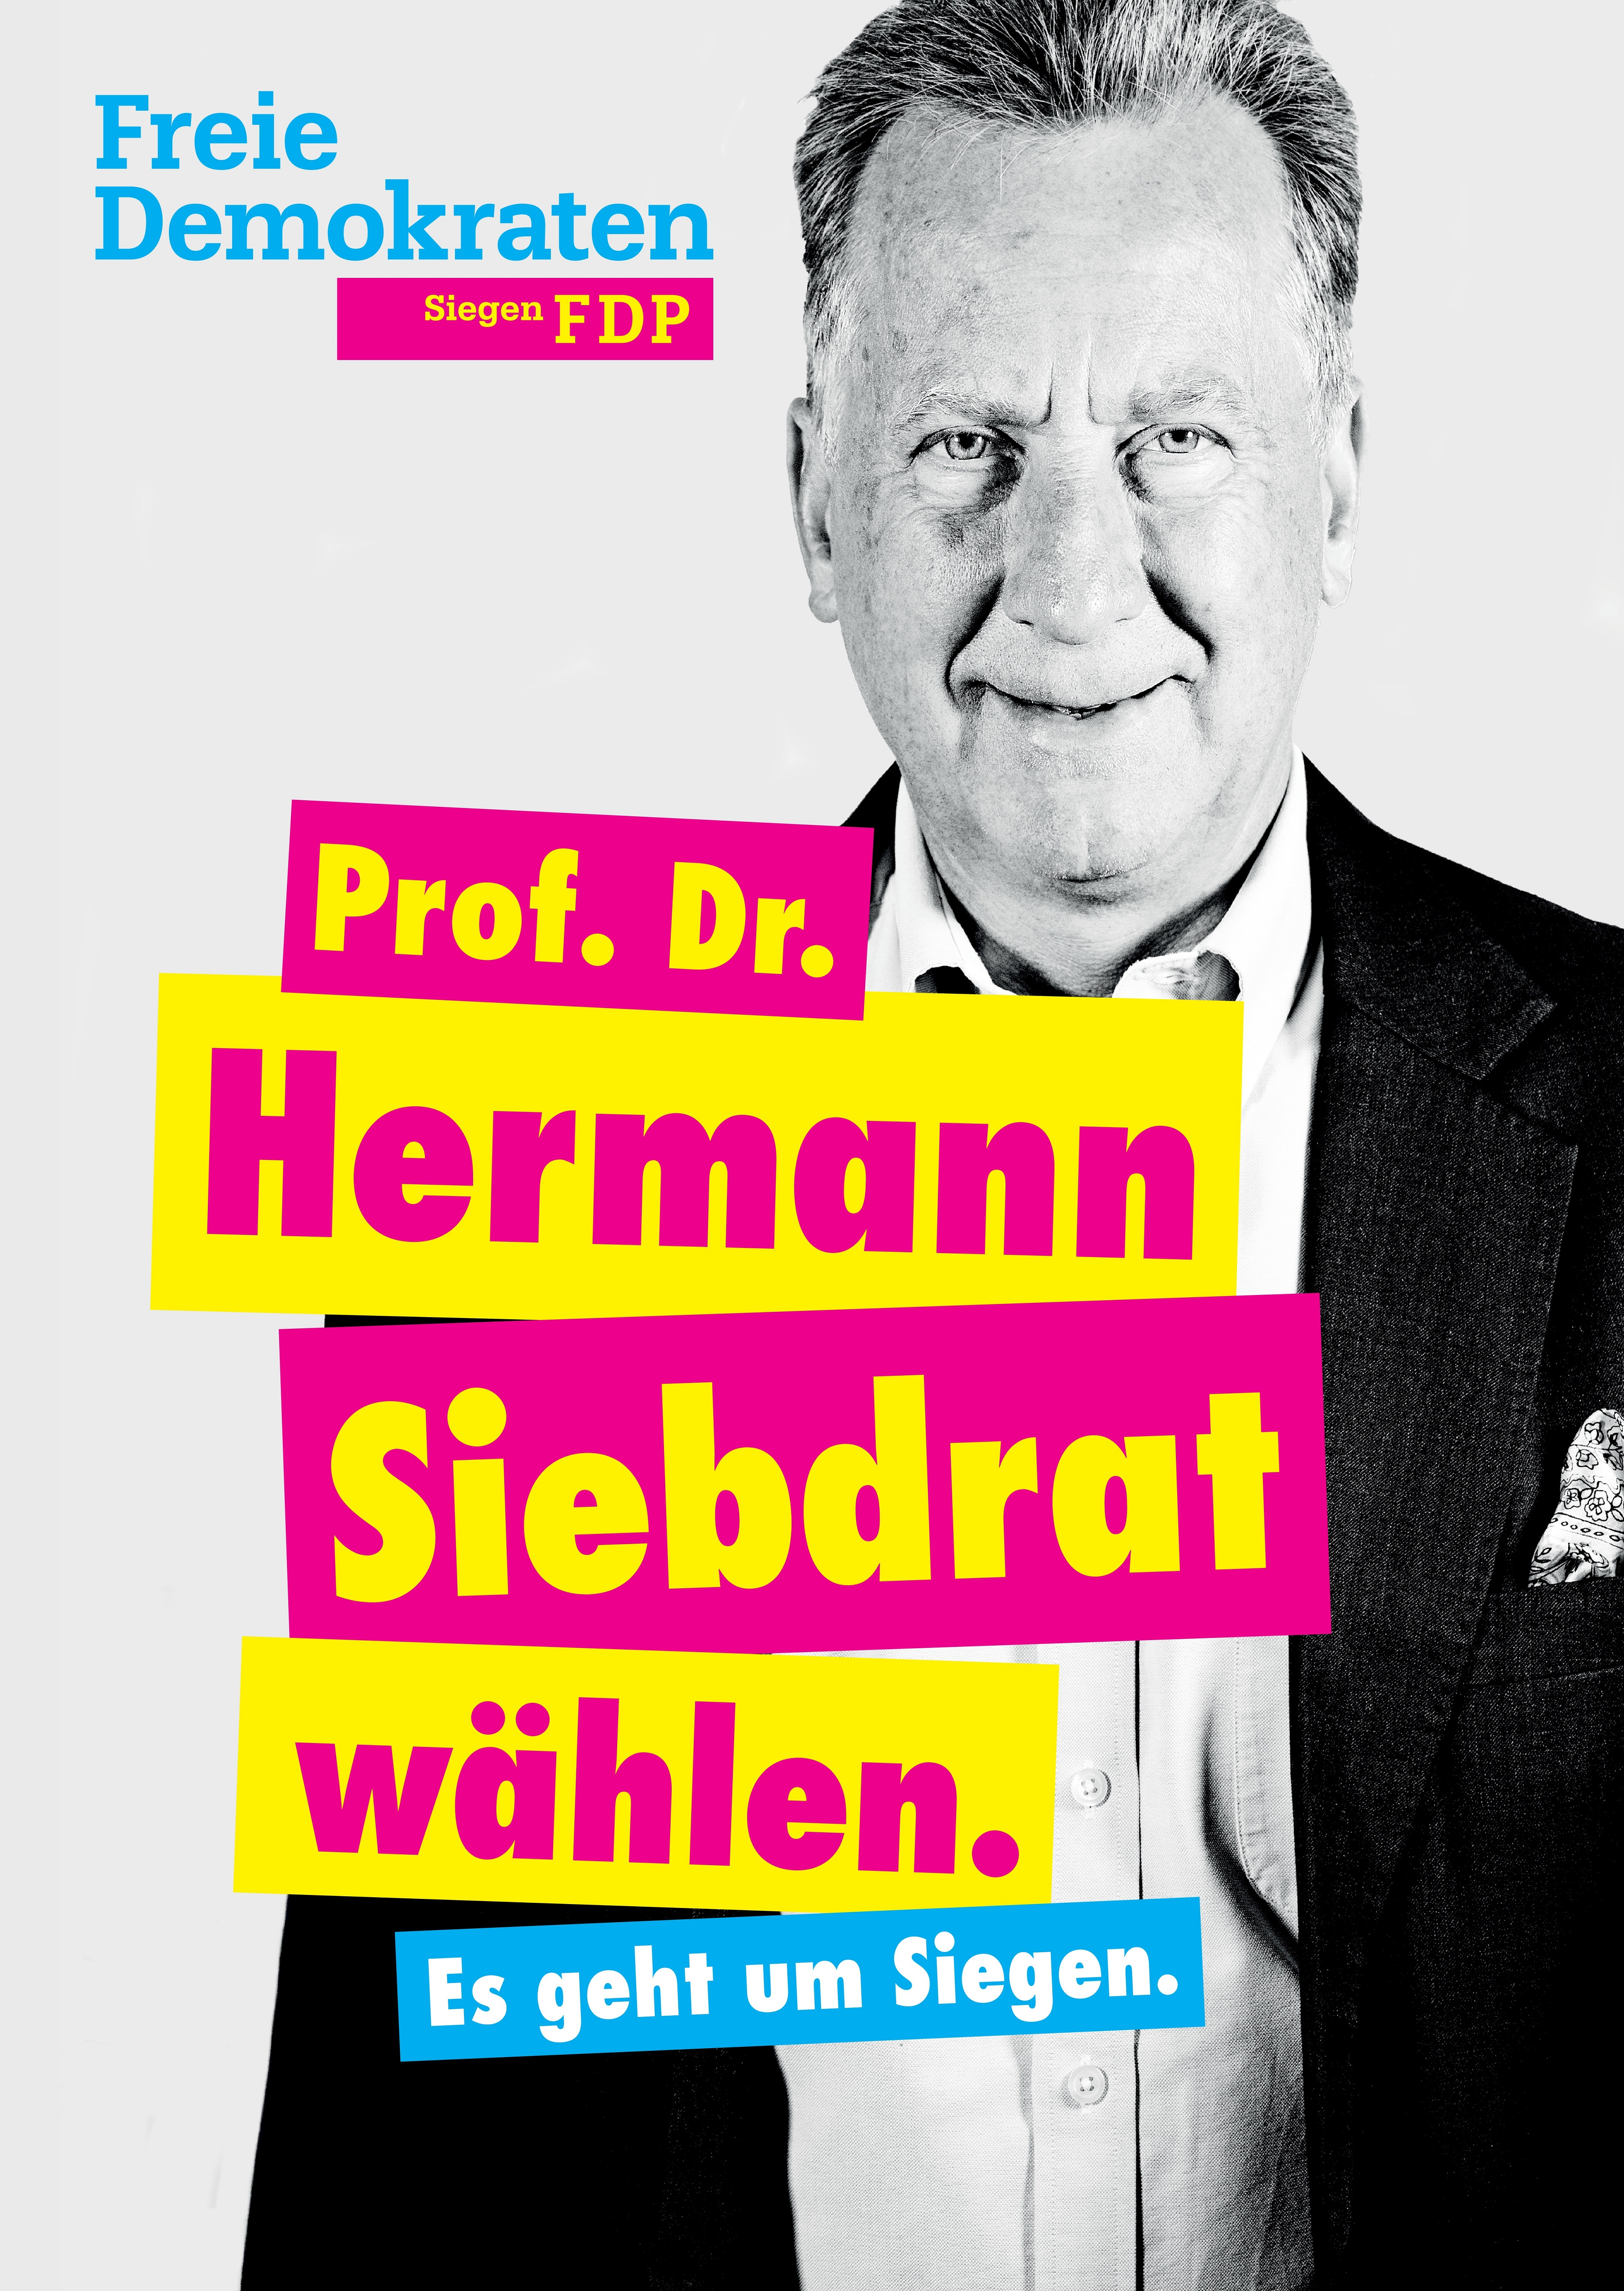 Prof. Dr. Hermann Siebdrat